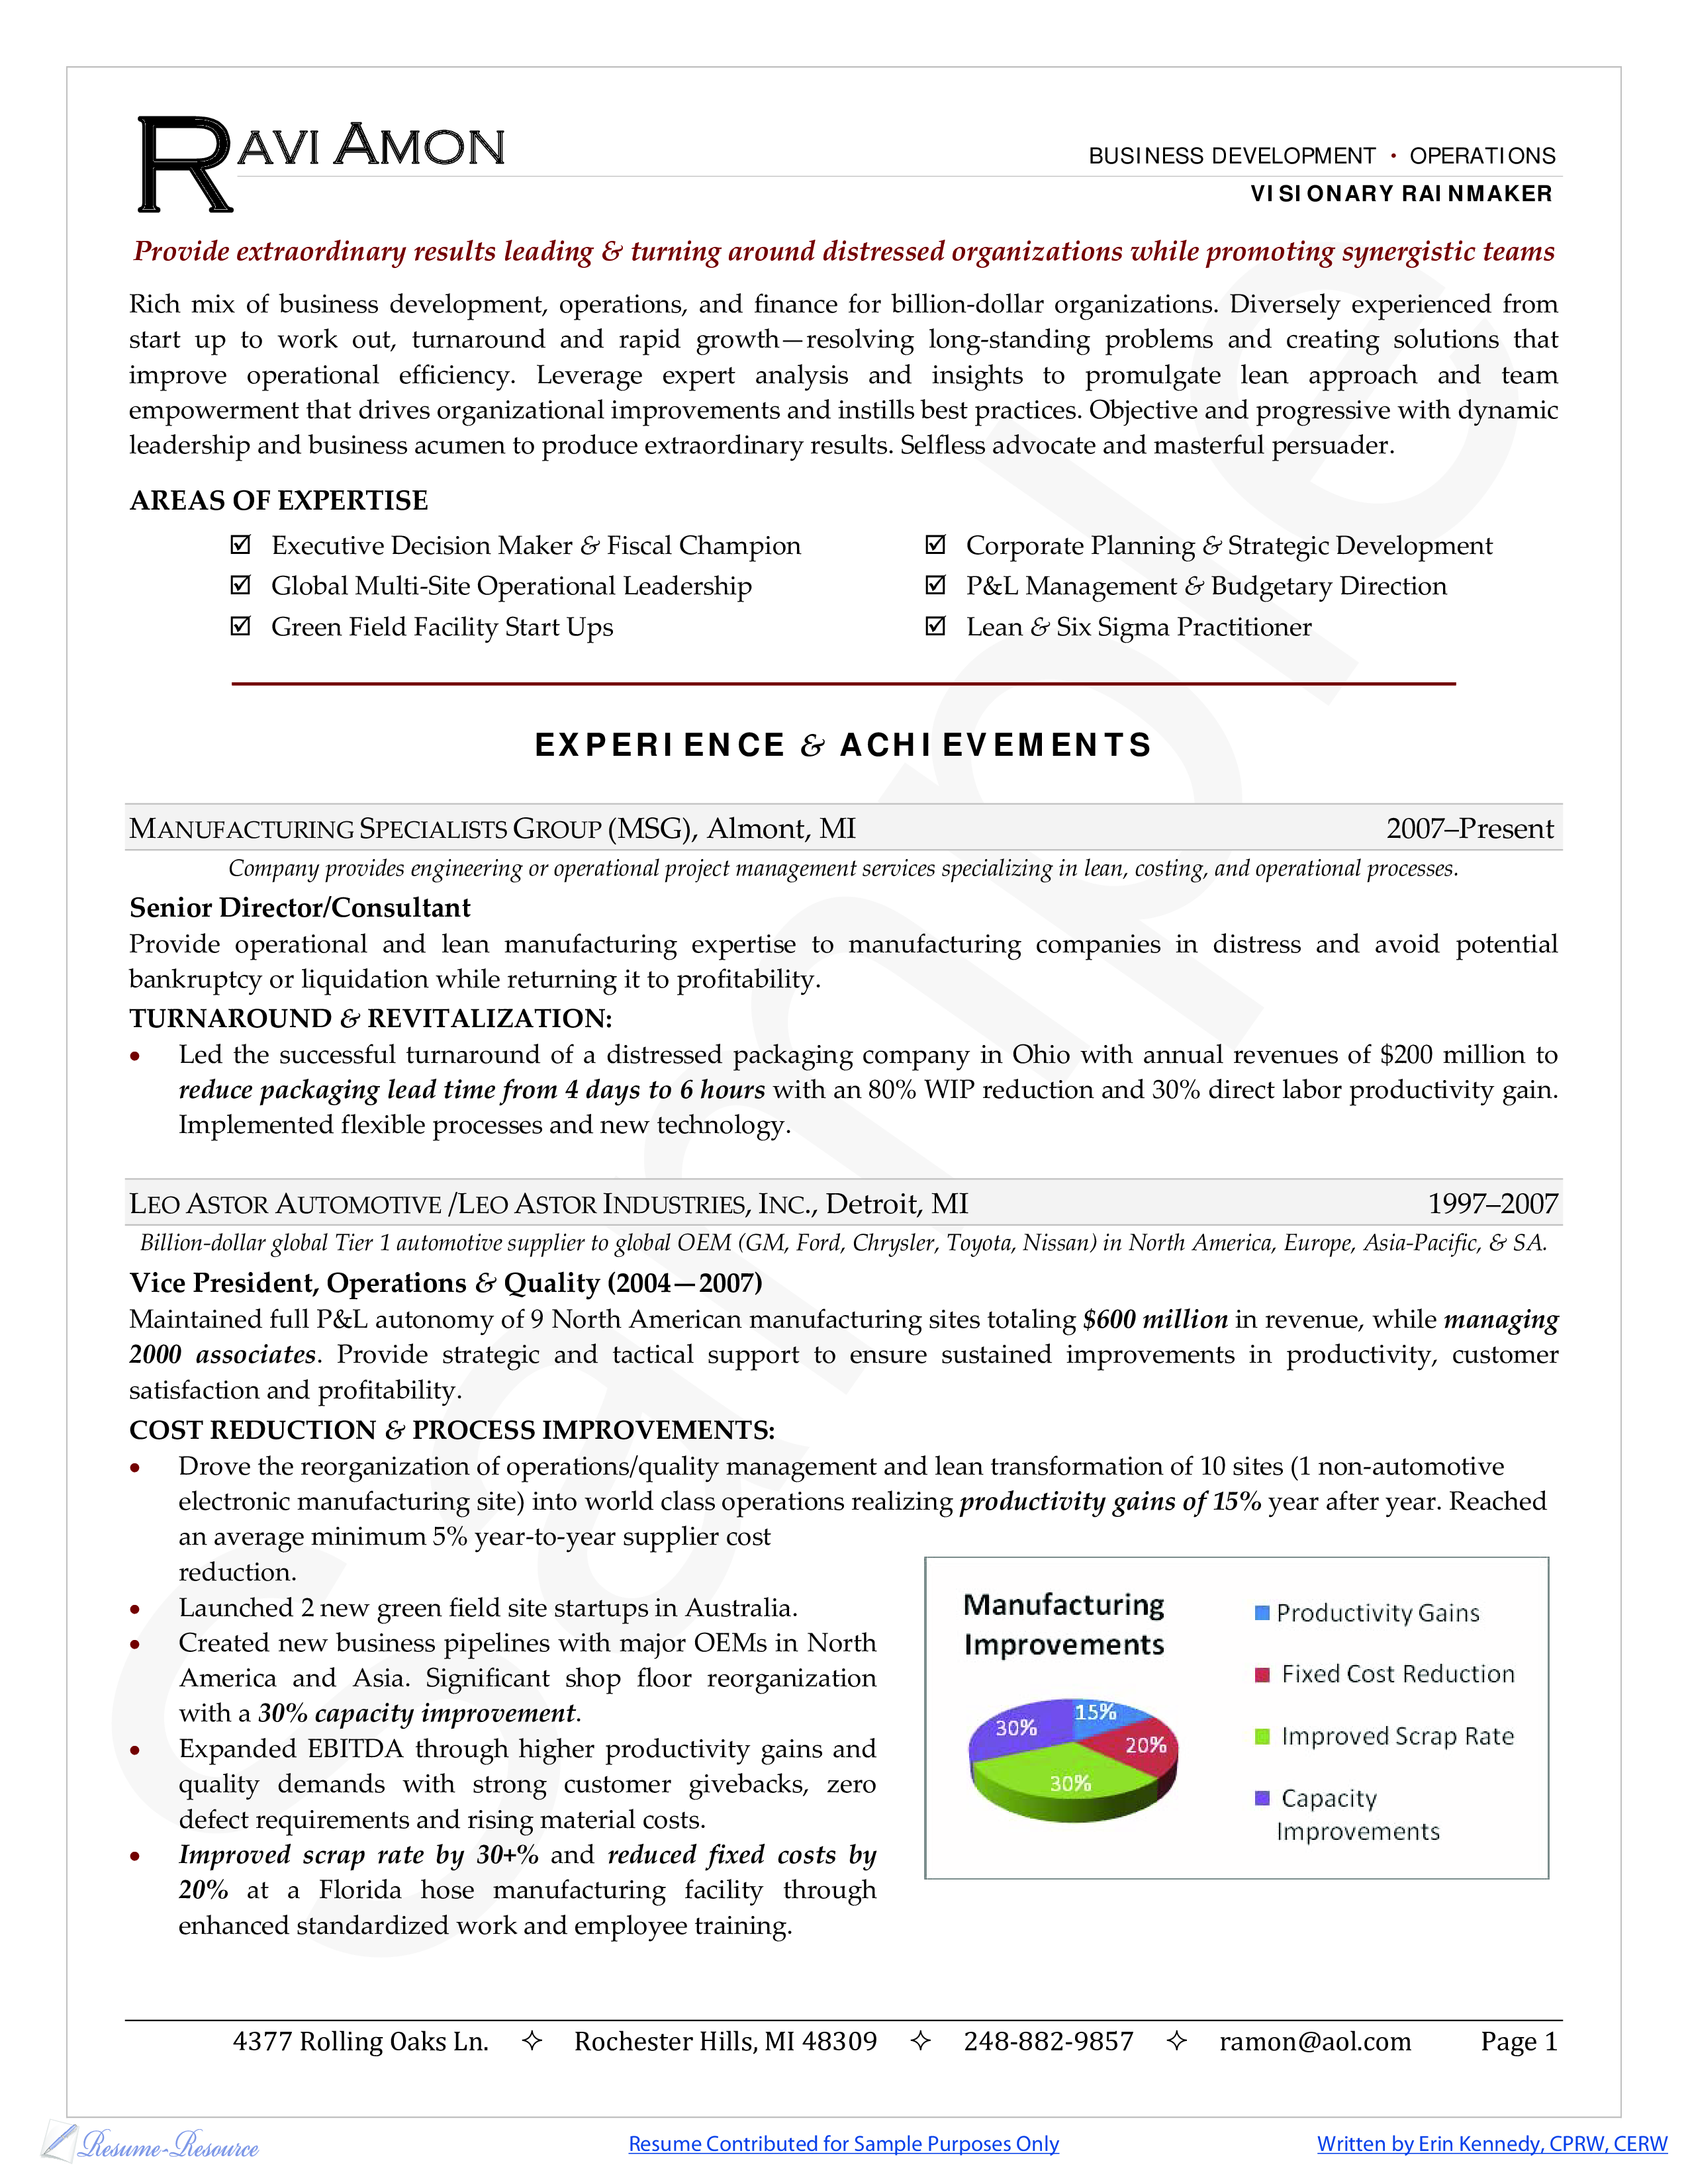 Business Development Manager Resume Templates At Allbusinesstemplates Com